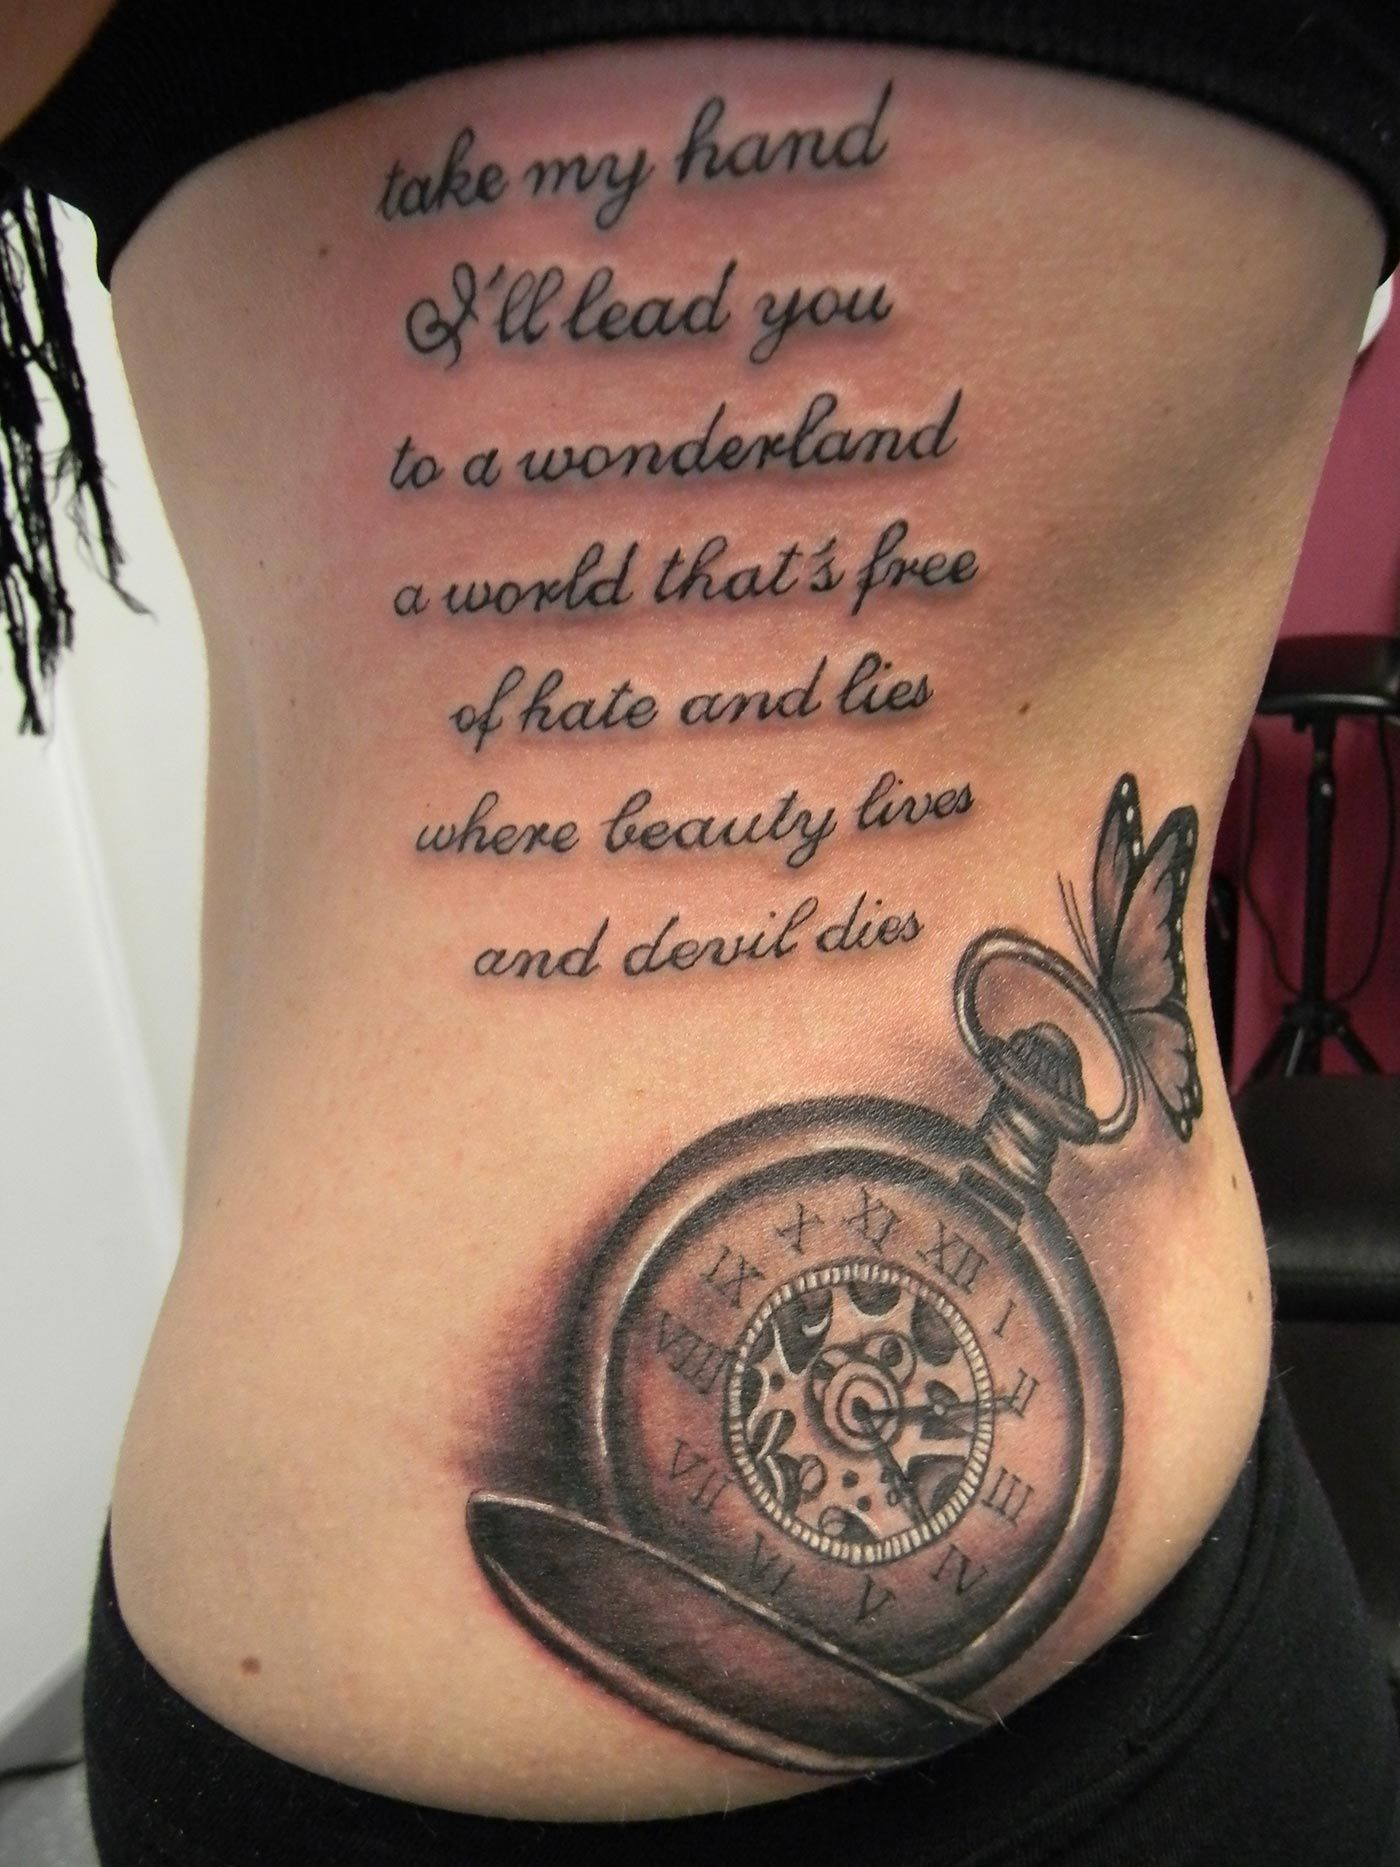 Tattoo Crazy & Beauty Tattoo in Innsbruck, Tirol